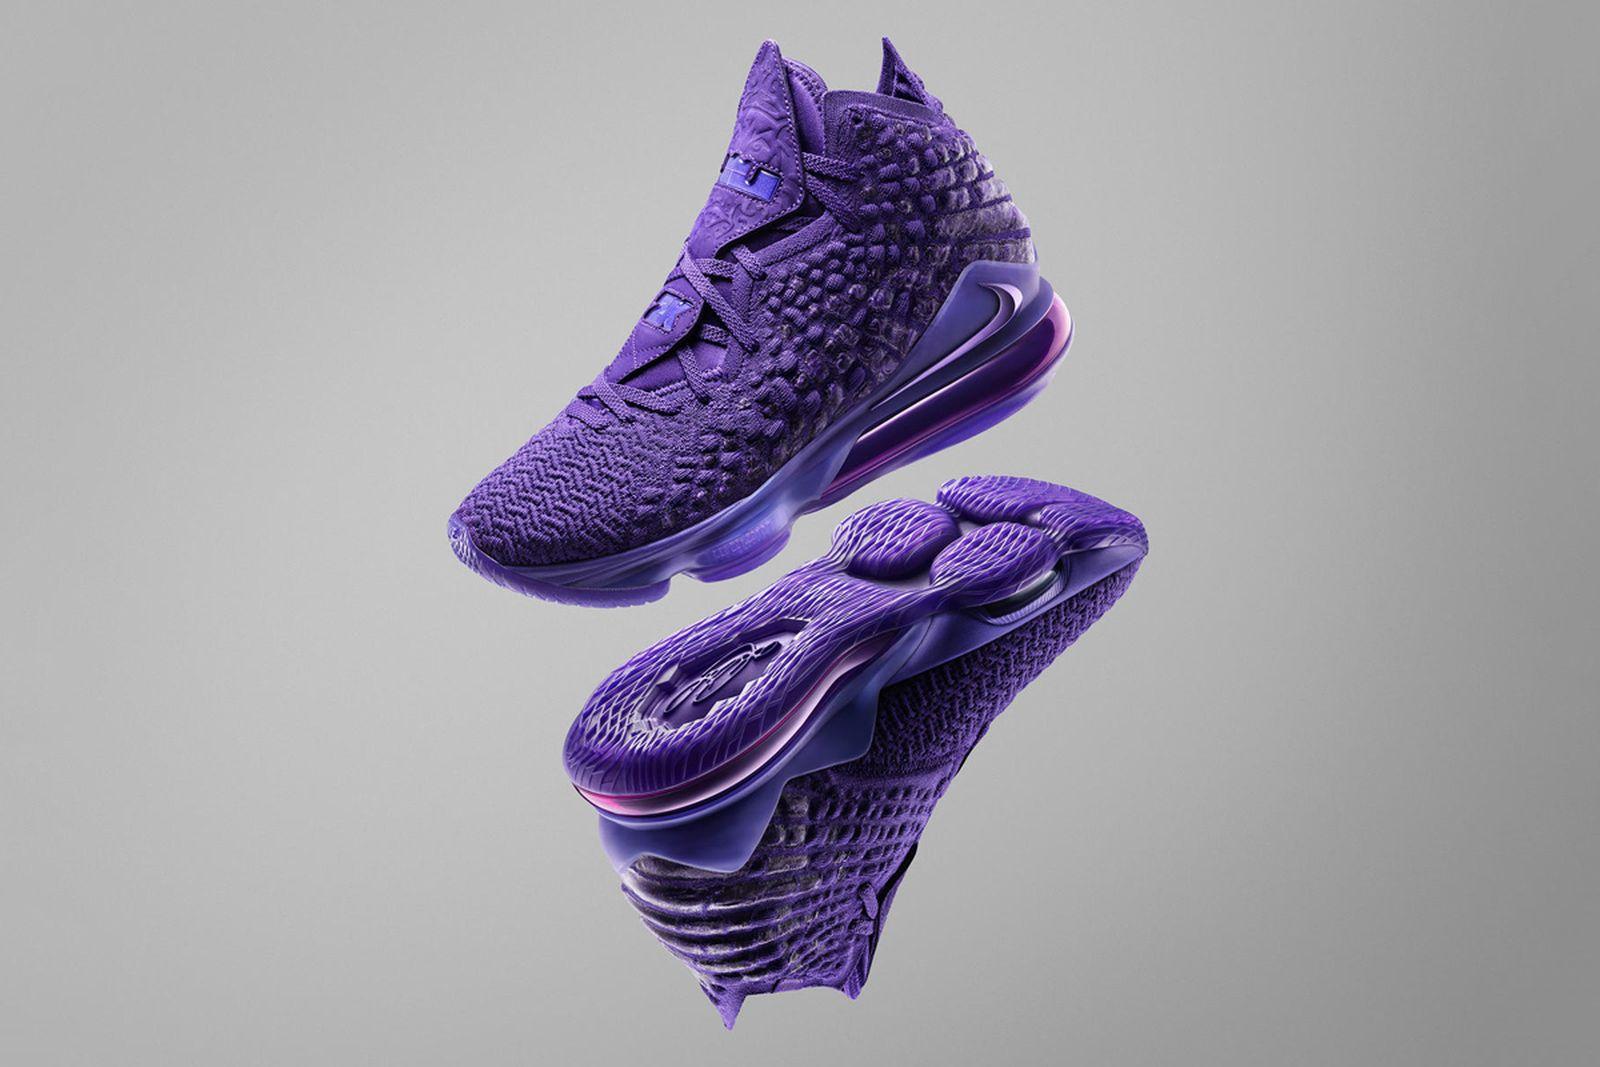 Nike SNKRS NBA 2K20